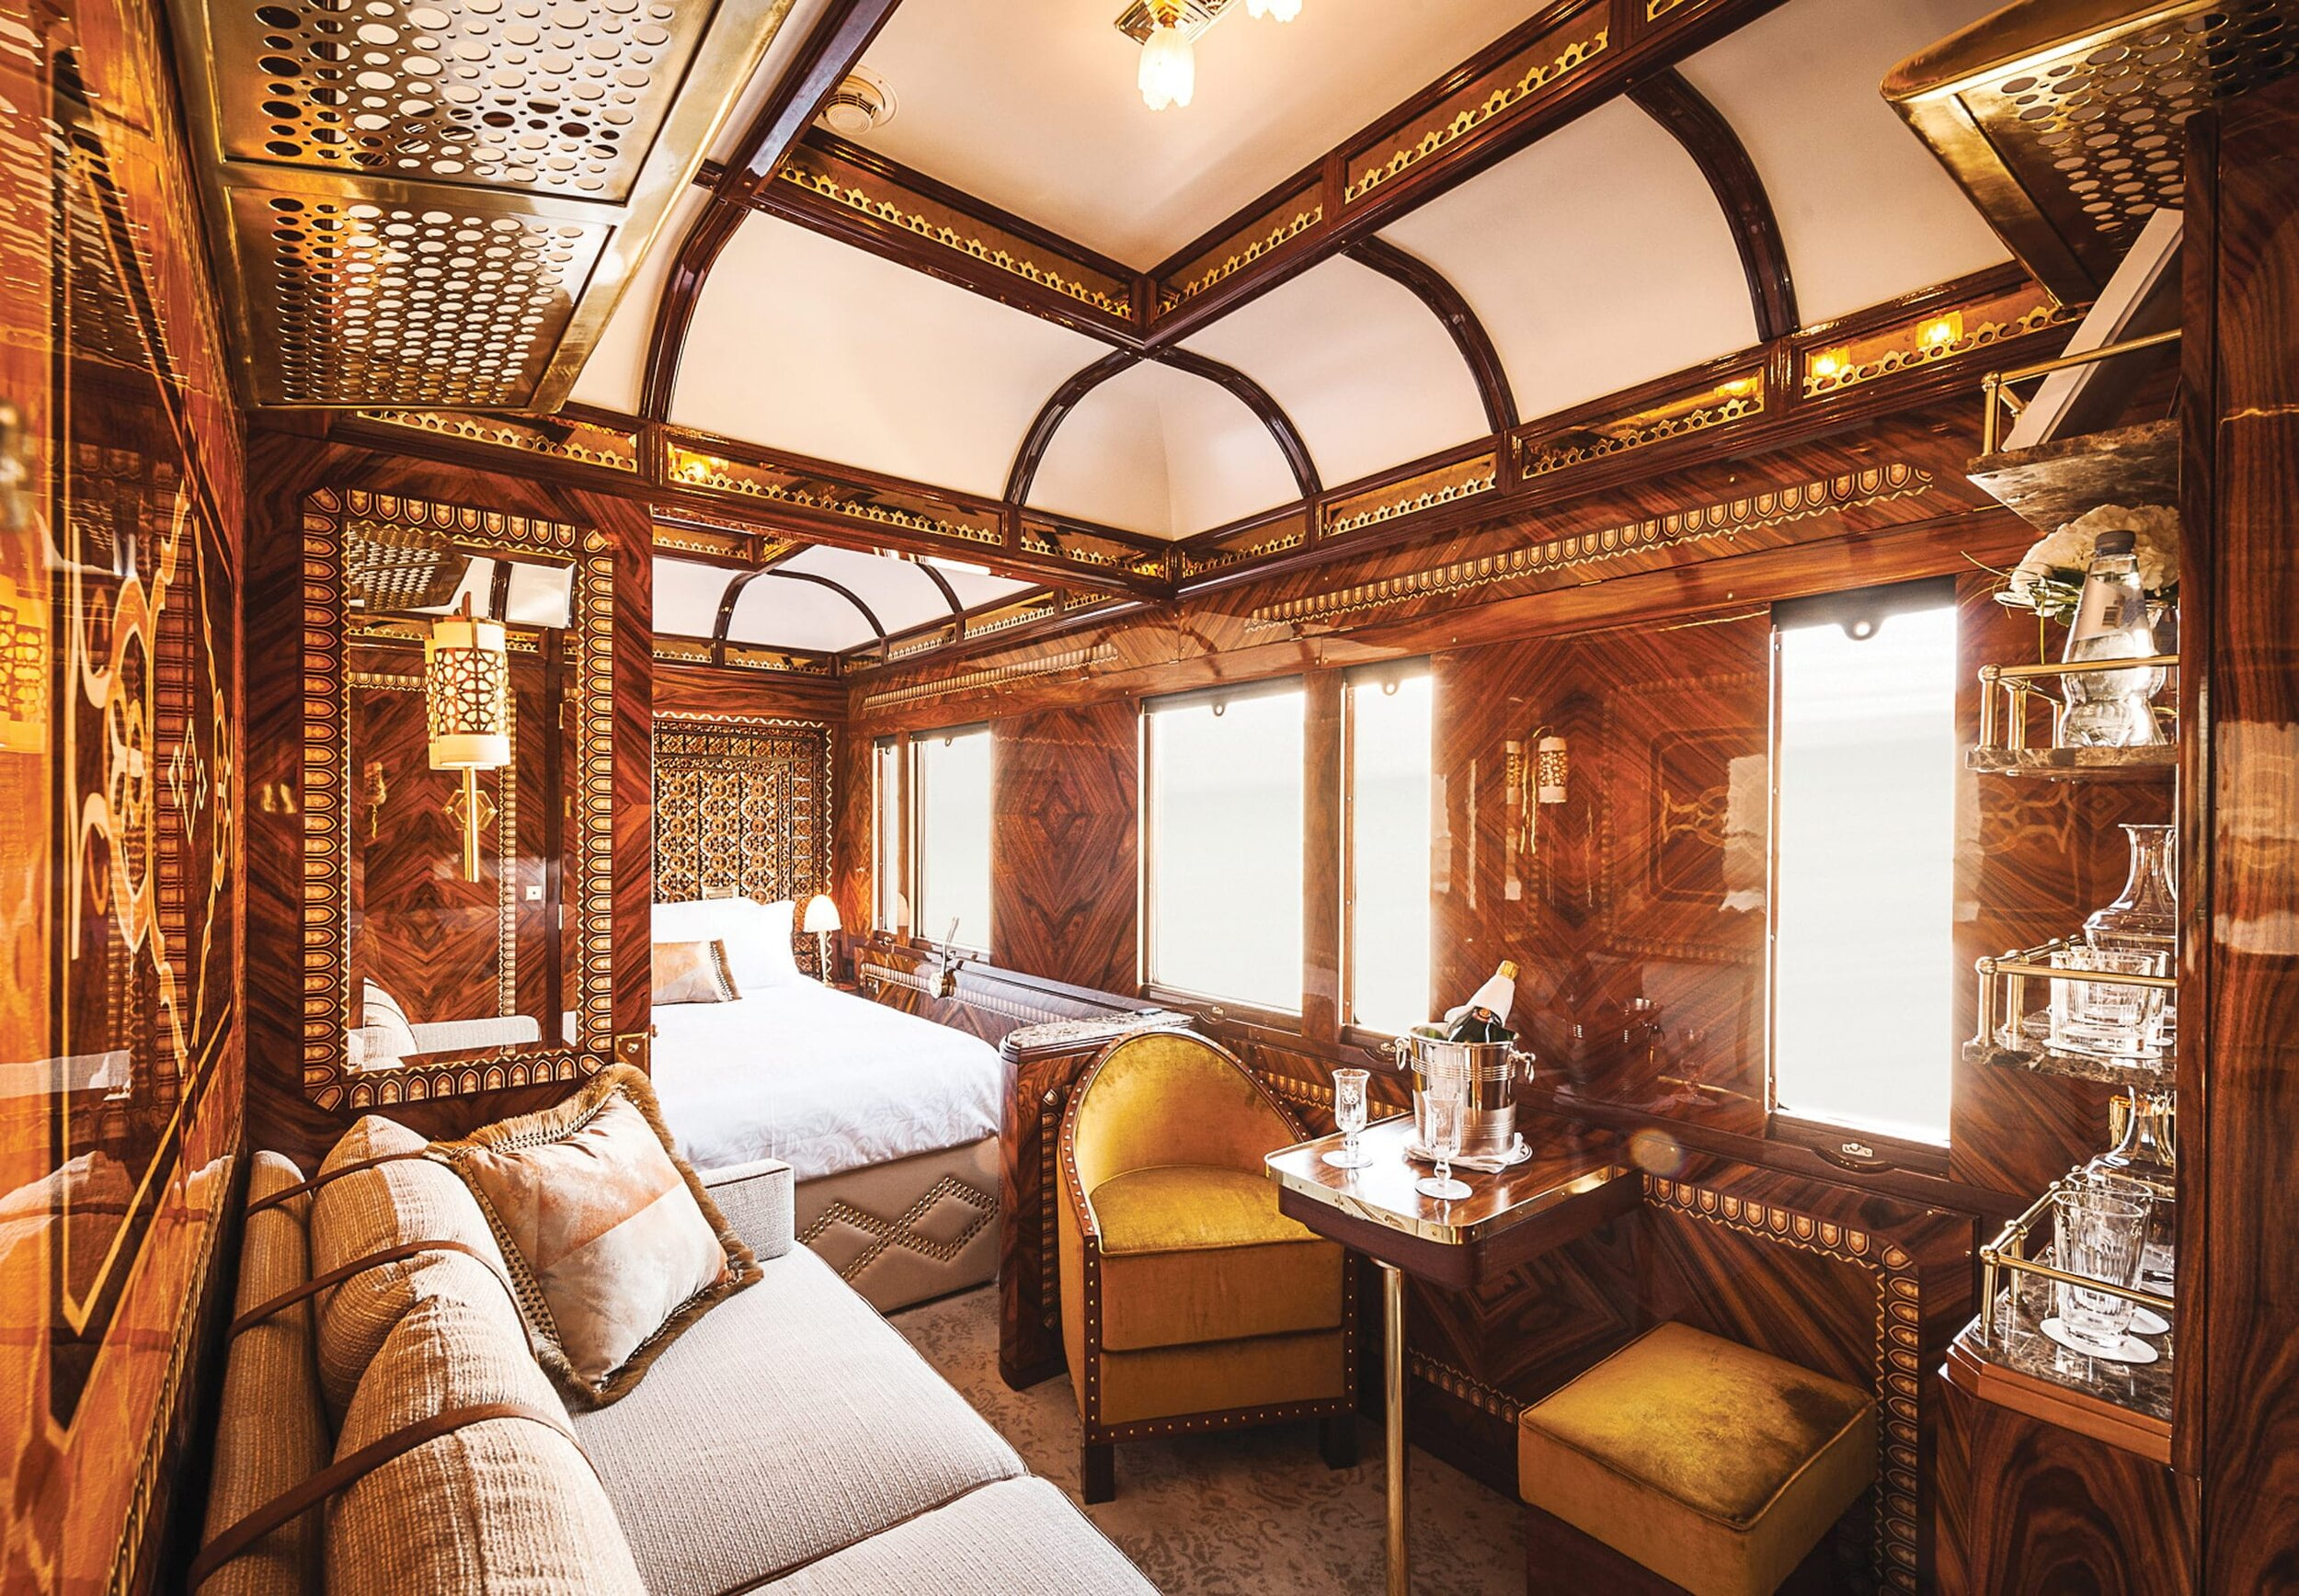 vso-acc-cabin-suite-istanbul02_2580x1792.jpg